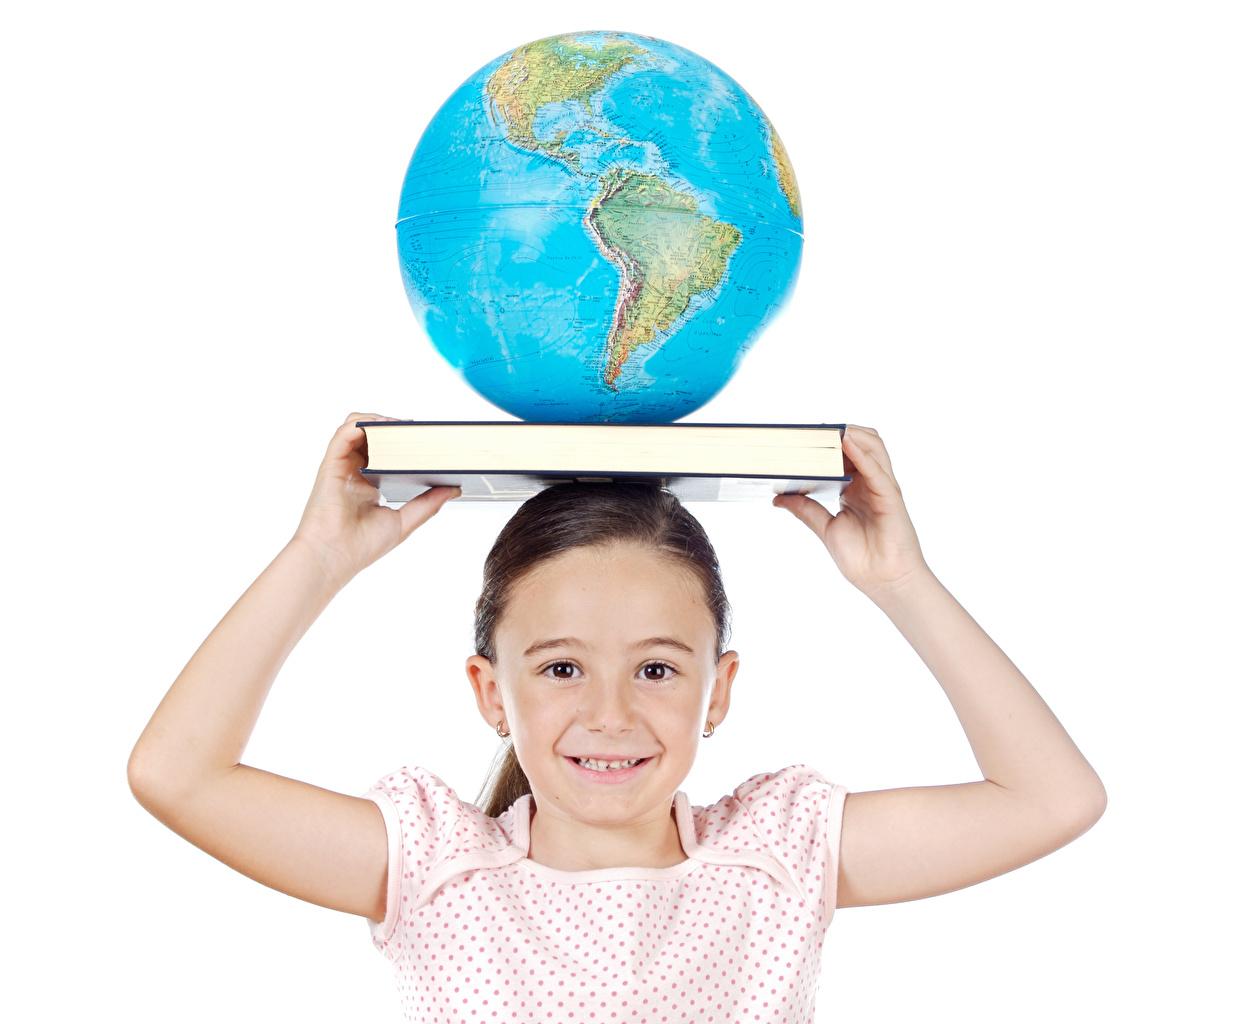 Картинка Девочки глобусом ребёнок Руки Книга белом фоне девочка Глобус глобусы Дети рука книги Белый фон белым фоном